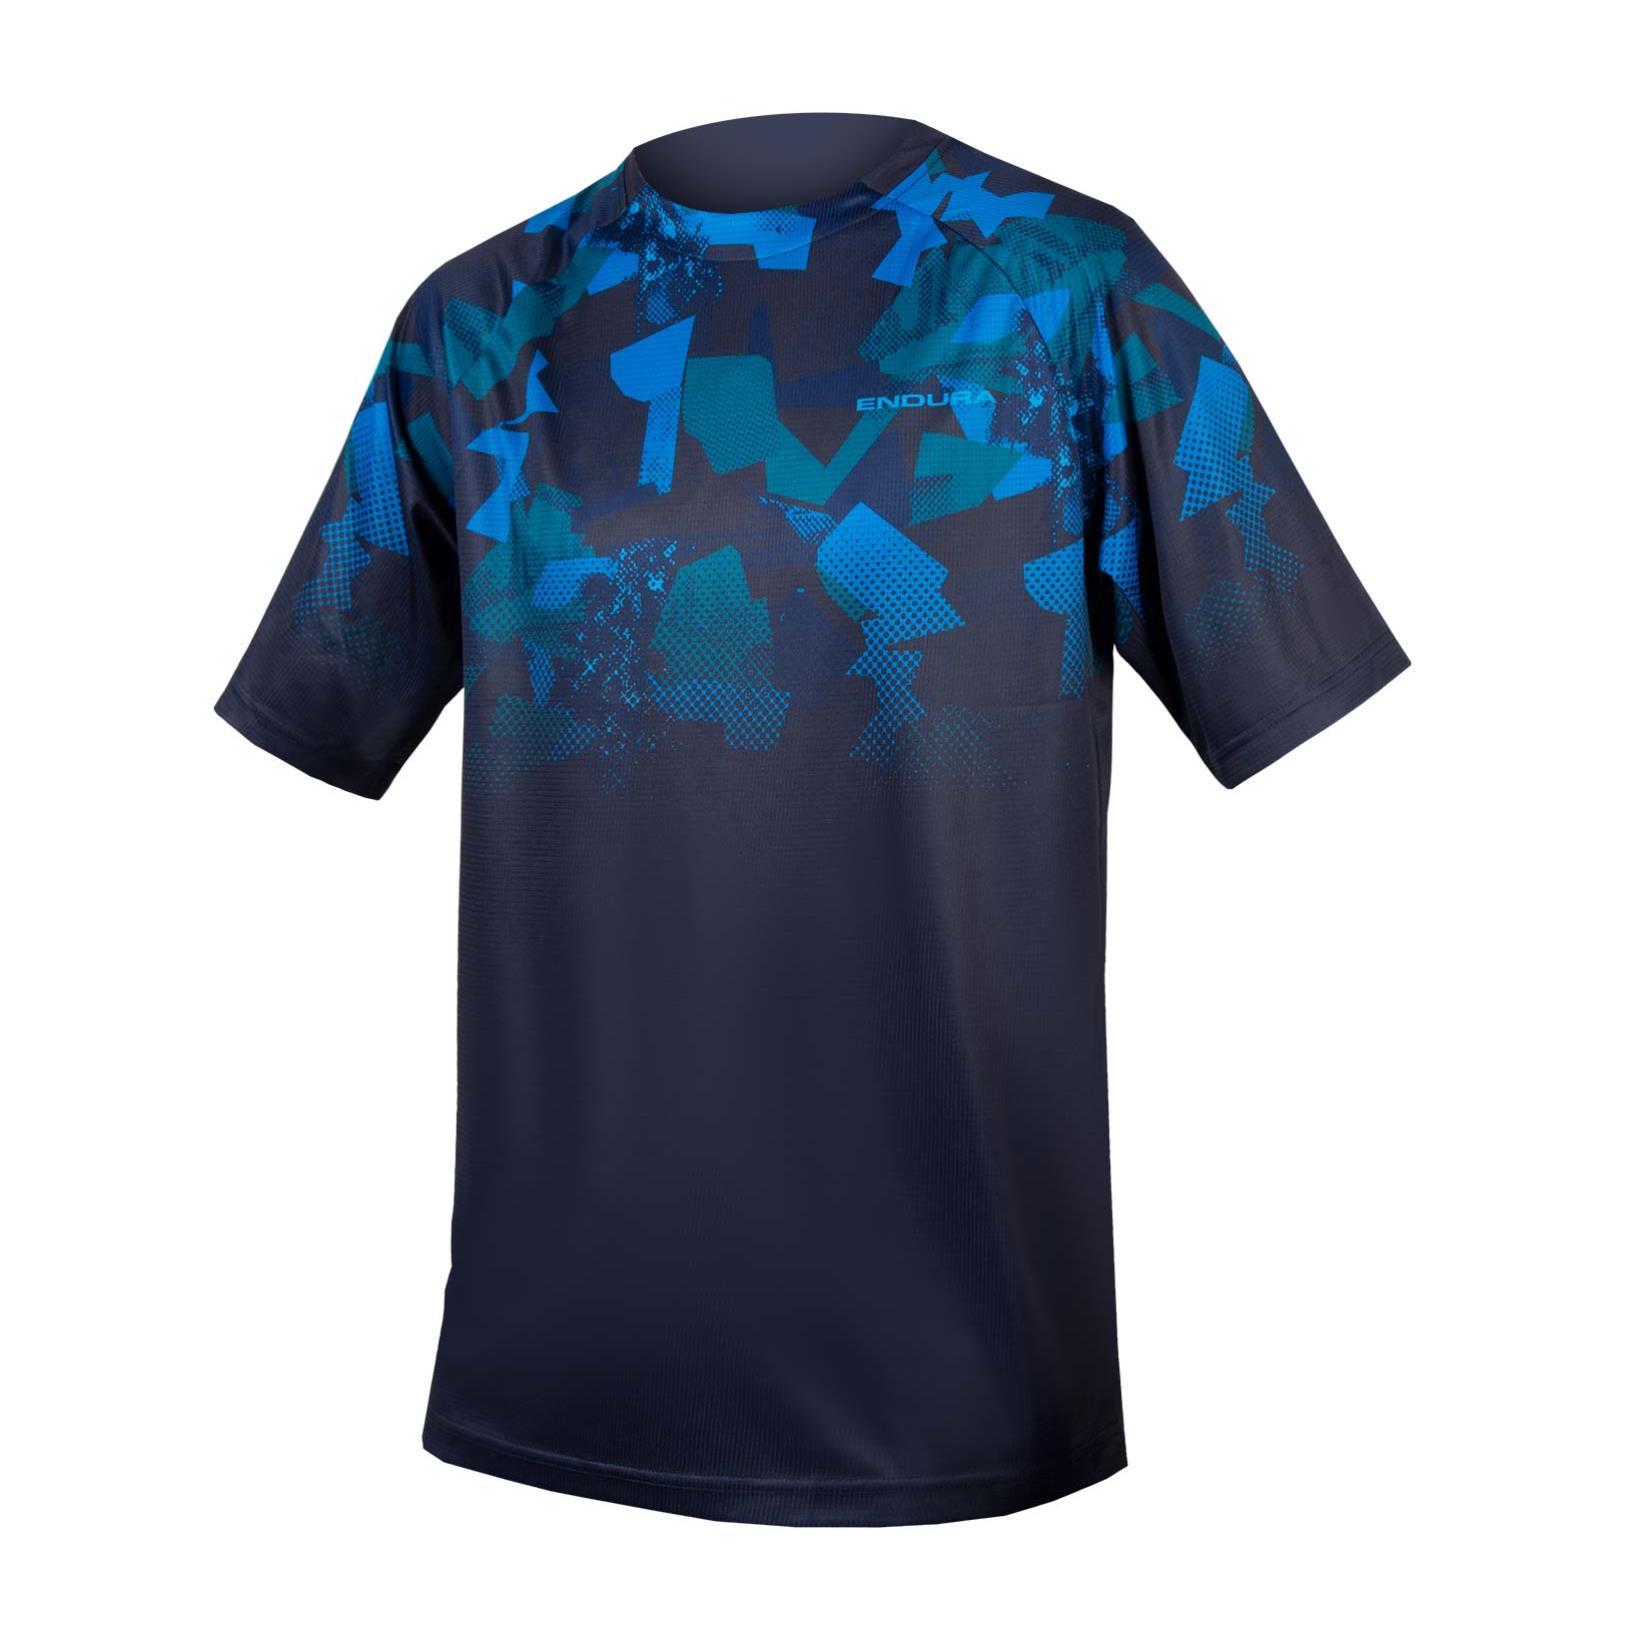 Nike Elite Kurzarm T-Shirt Basketball Sport Tee Shirt Trikot Blau 830949 480